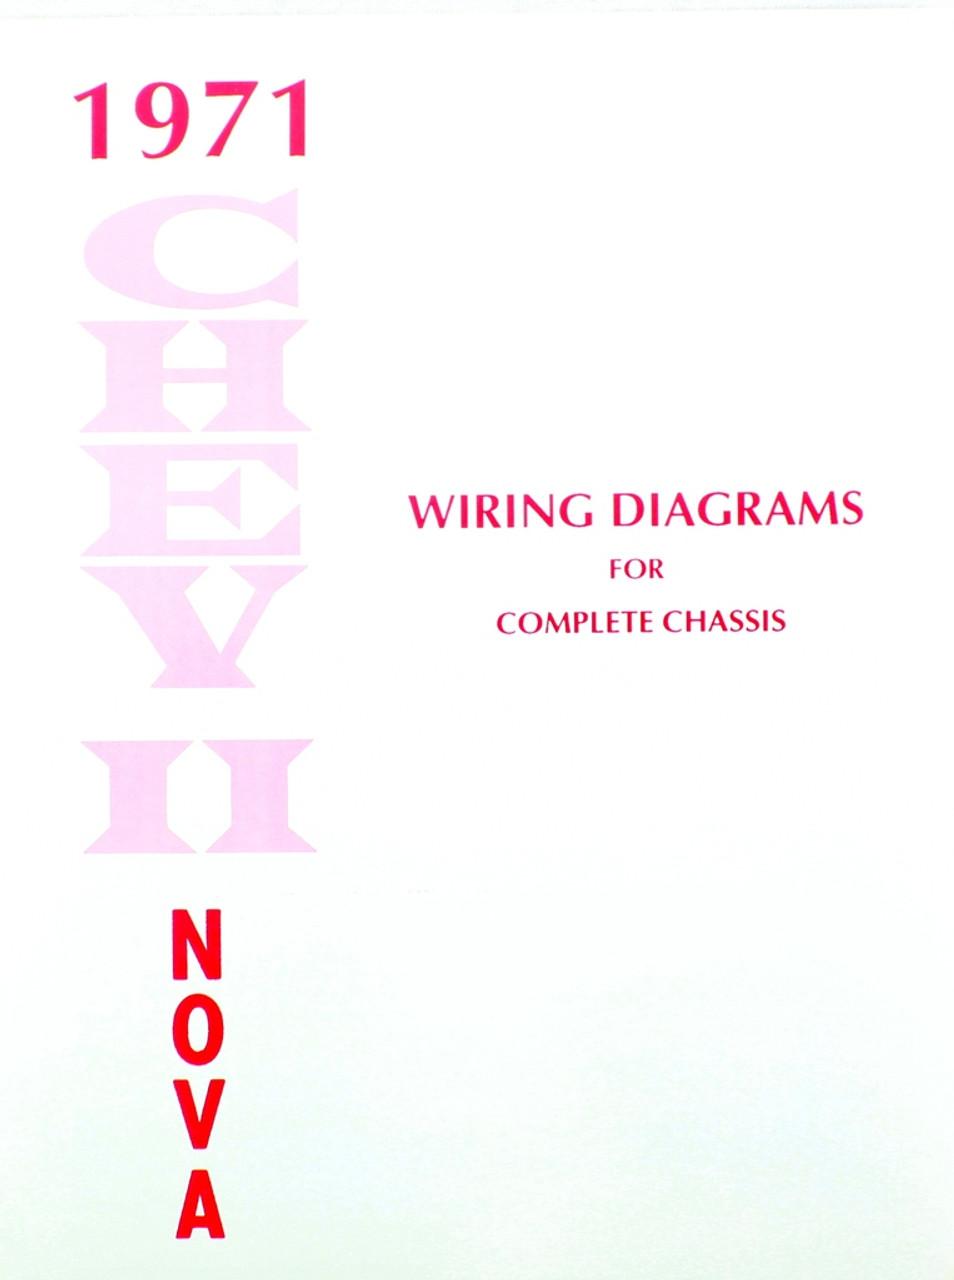 L1918_zpssqx78v3k__99584.1507329936?c\=2 1971 chevy nova wiring diagram wiring diagram simonand 1974 Rupp Snowmobile at bayanpartner.co